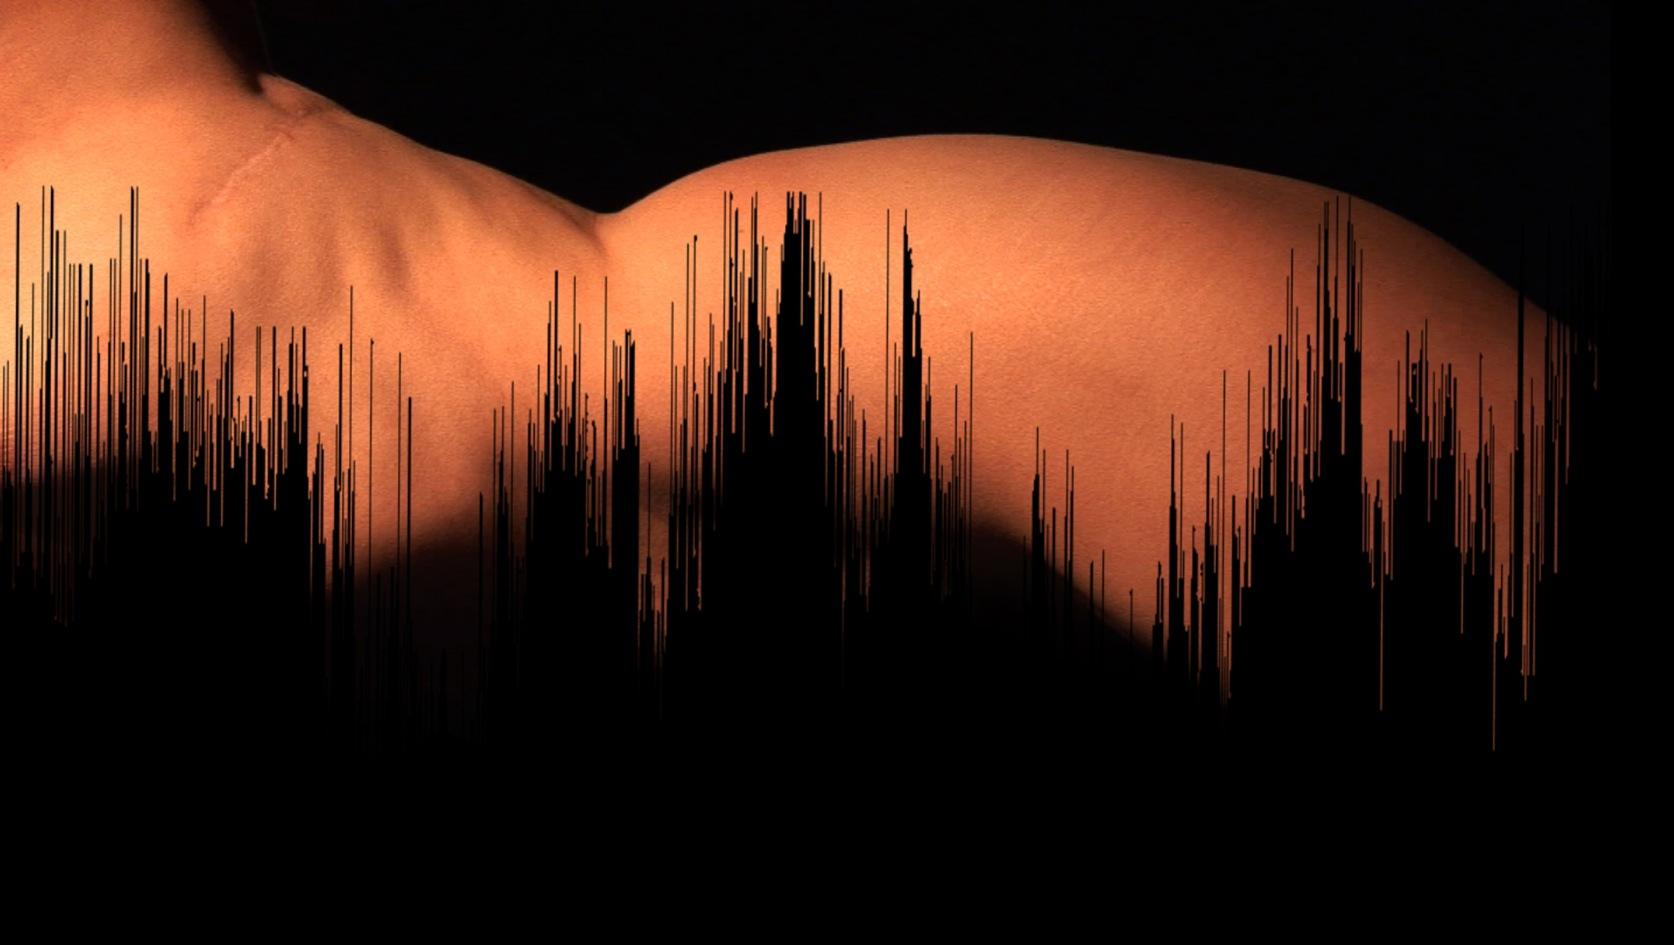 Bodywaves 8